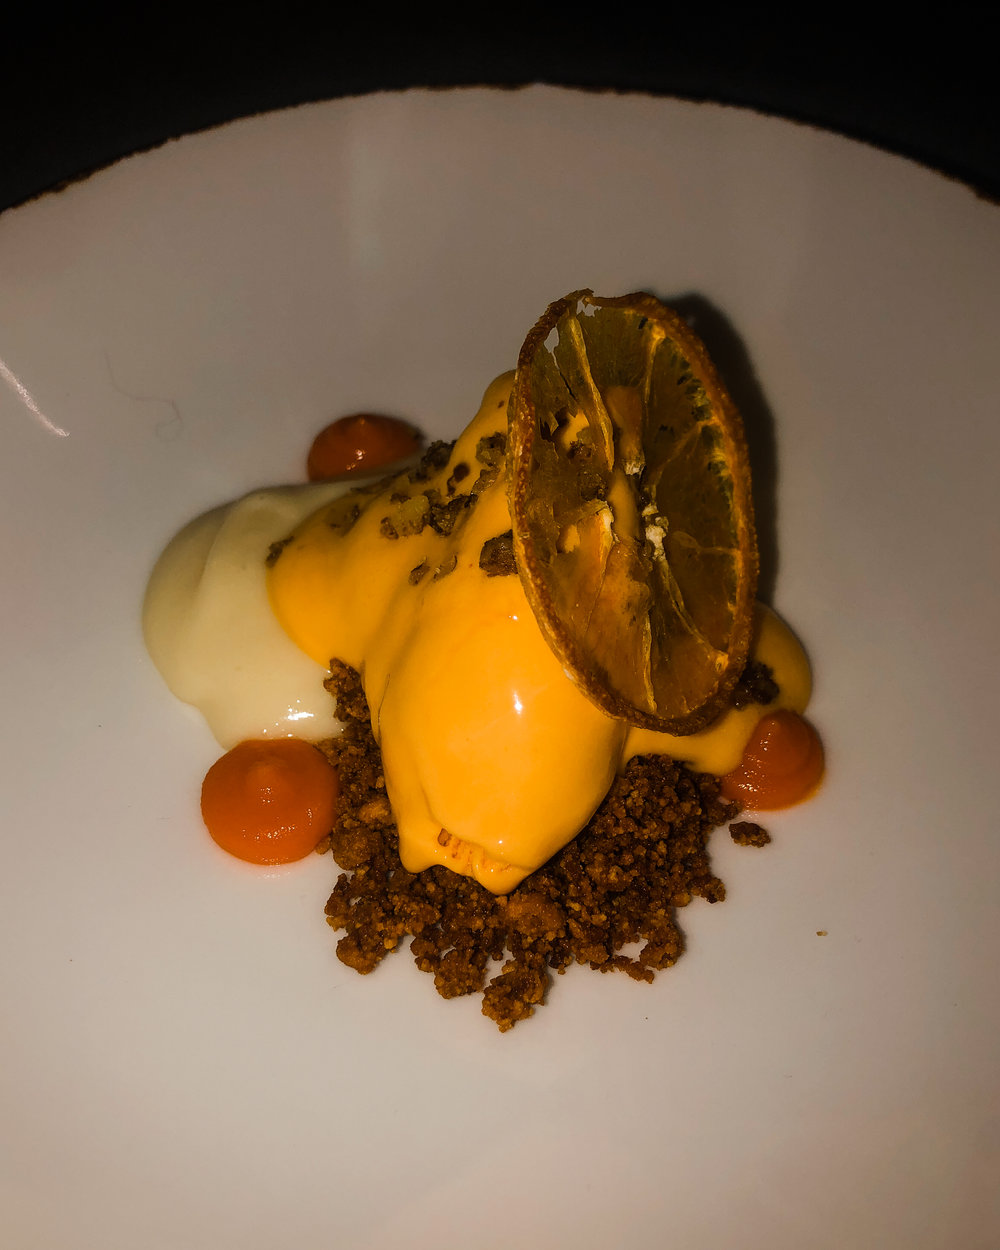 Walnut Chiffon with carrot gelato